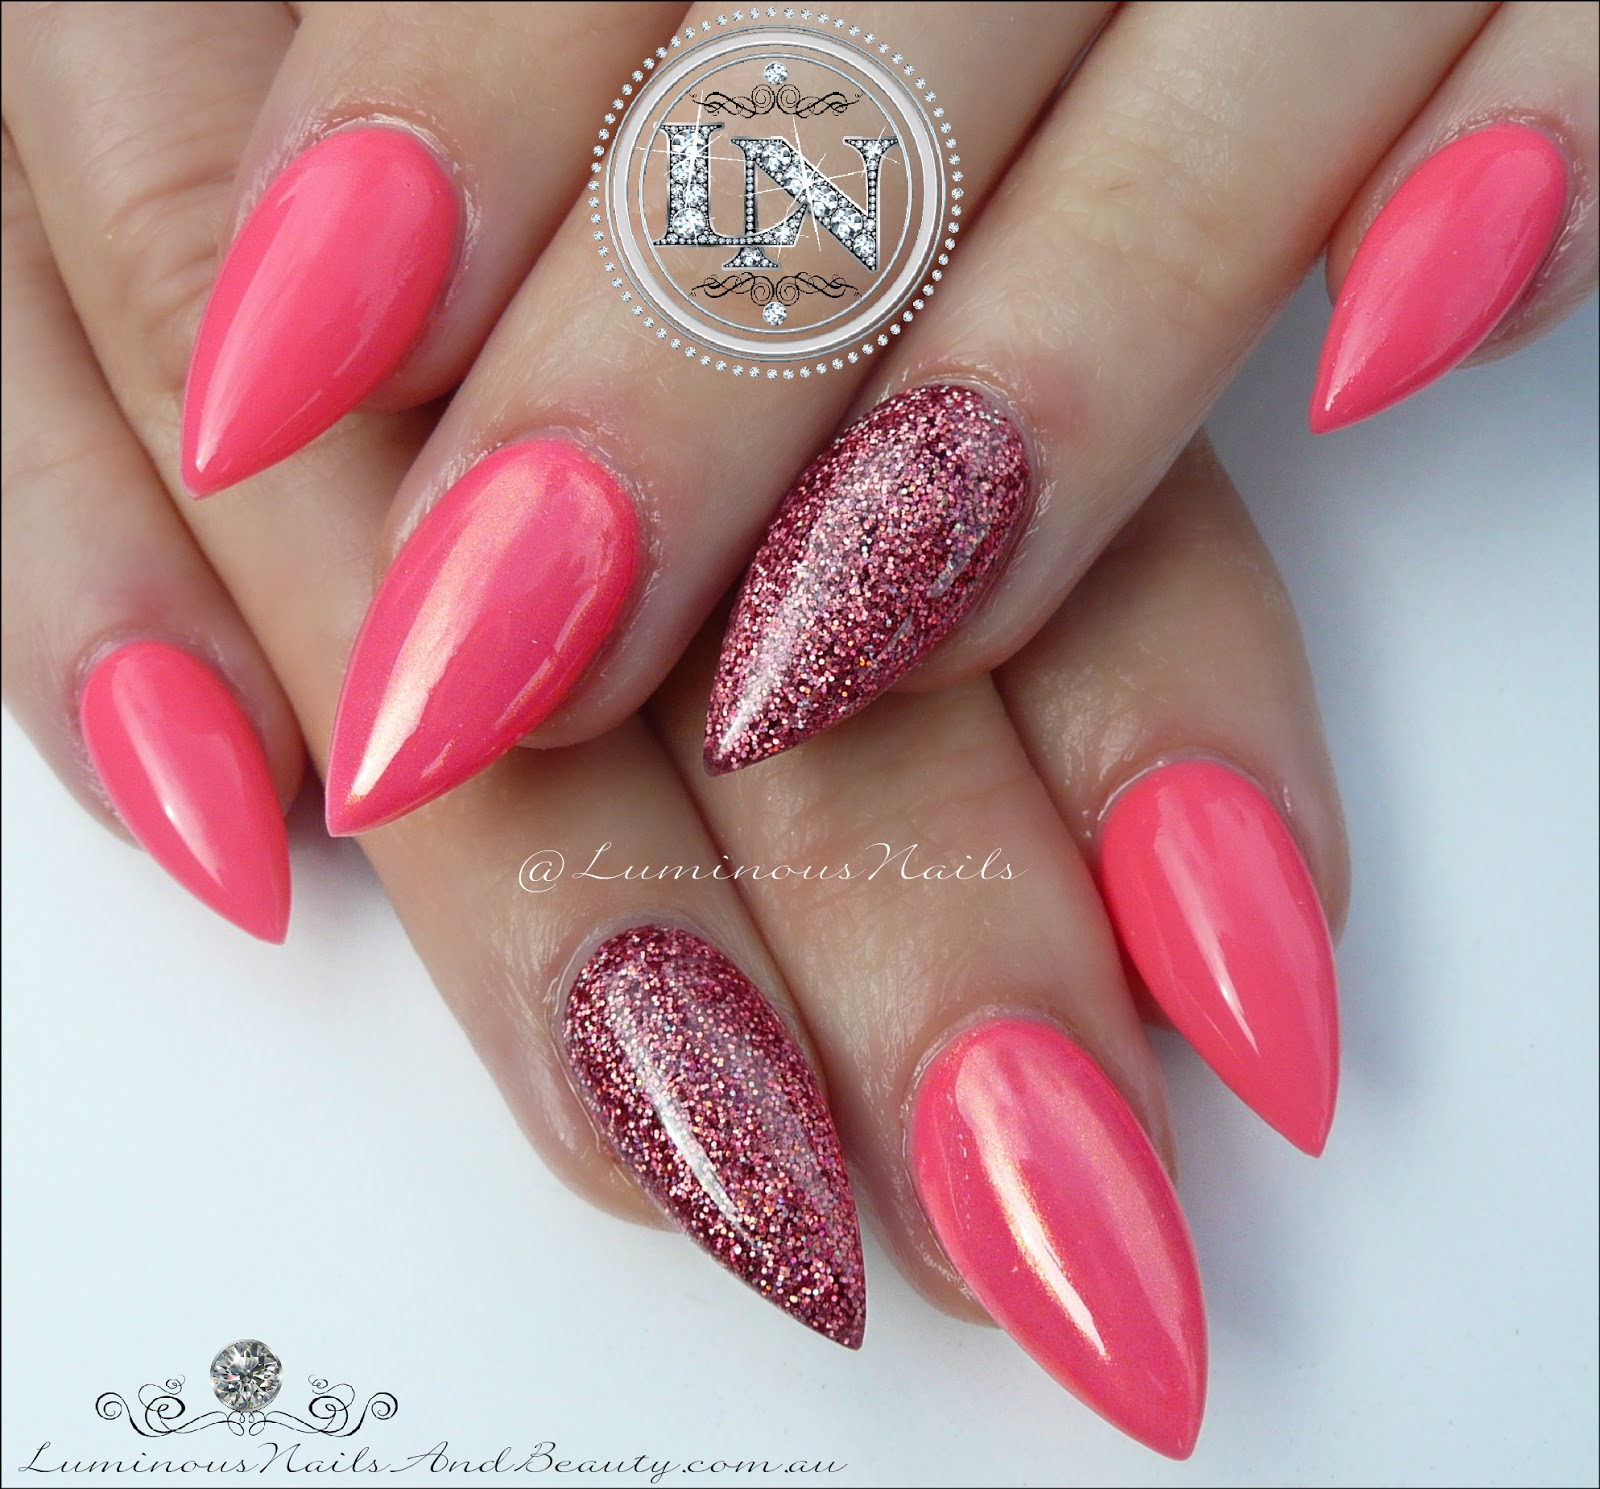 Gorgeous C Glittery Rose Pink Glitter Acrylic Nails